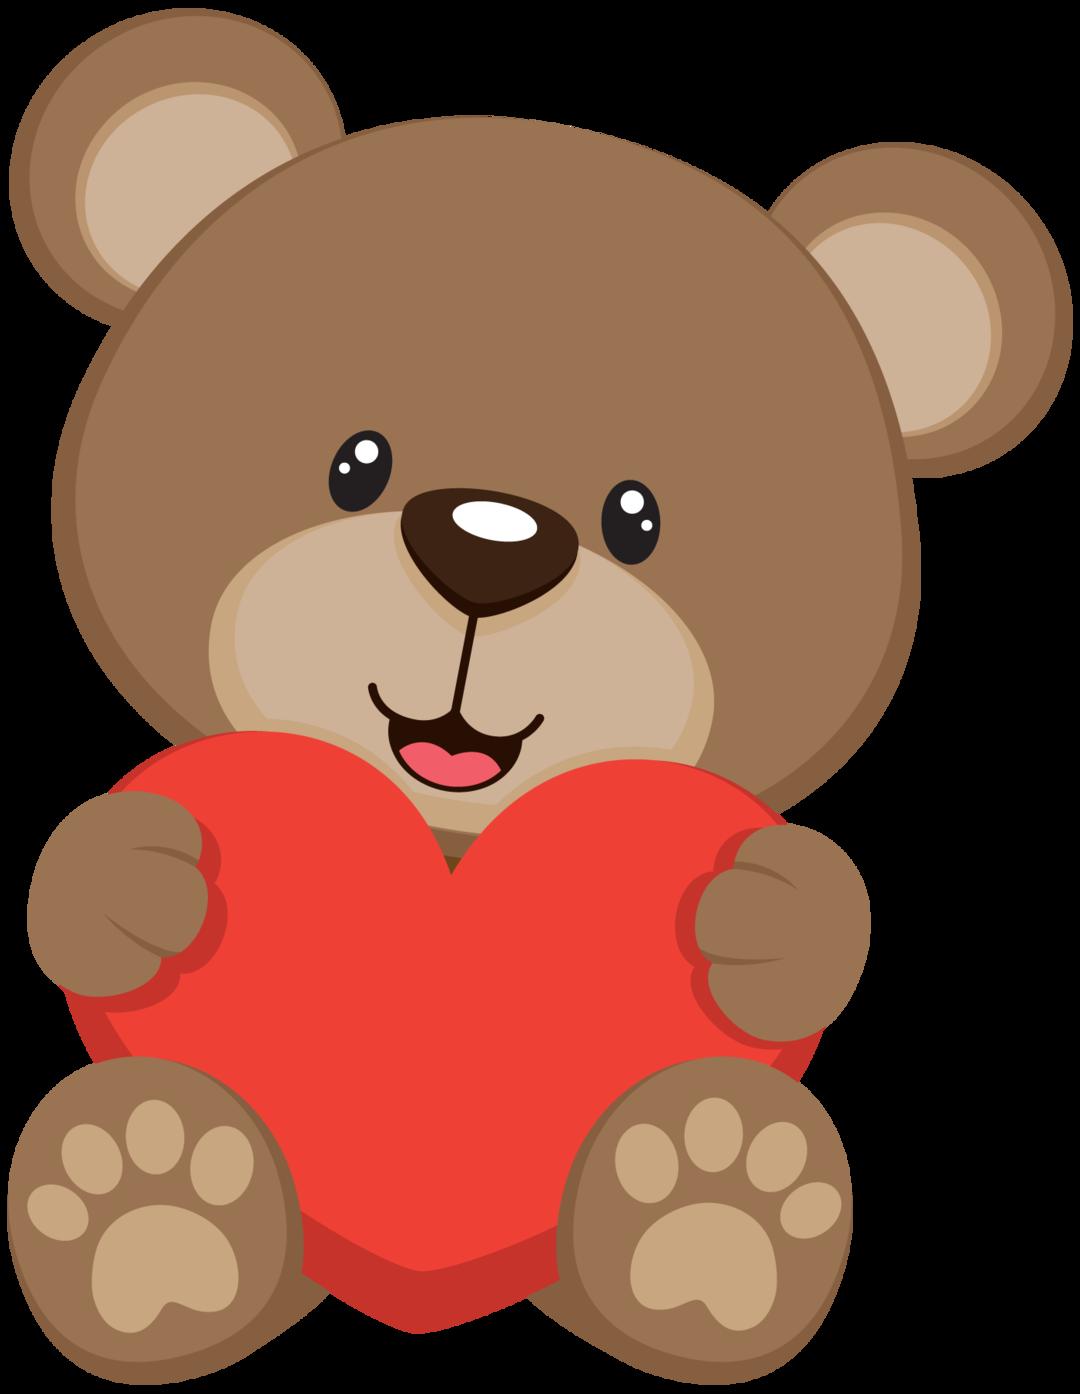 TUBES URSINHOS | manualidades | Teddy bear pictures, Teddy ... #aplikeyorgandesenleri